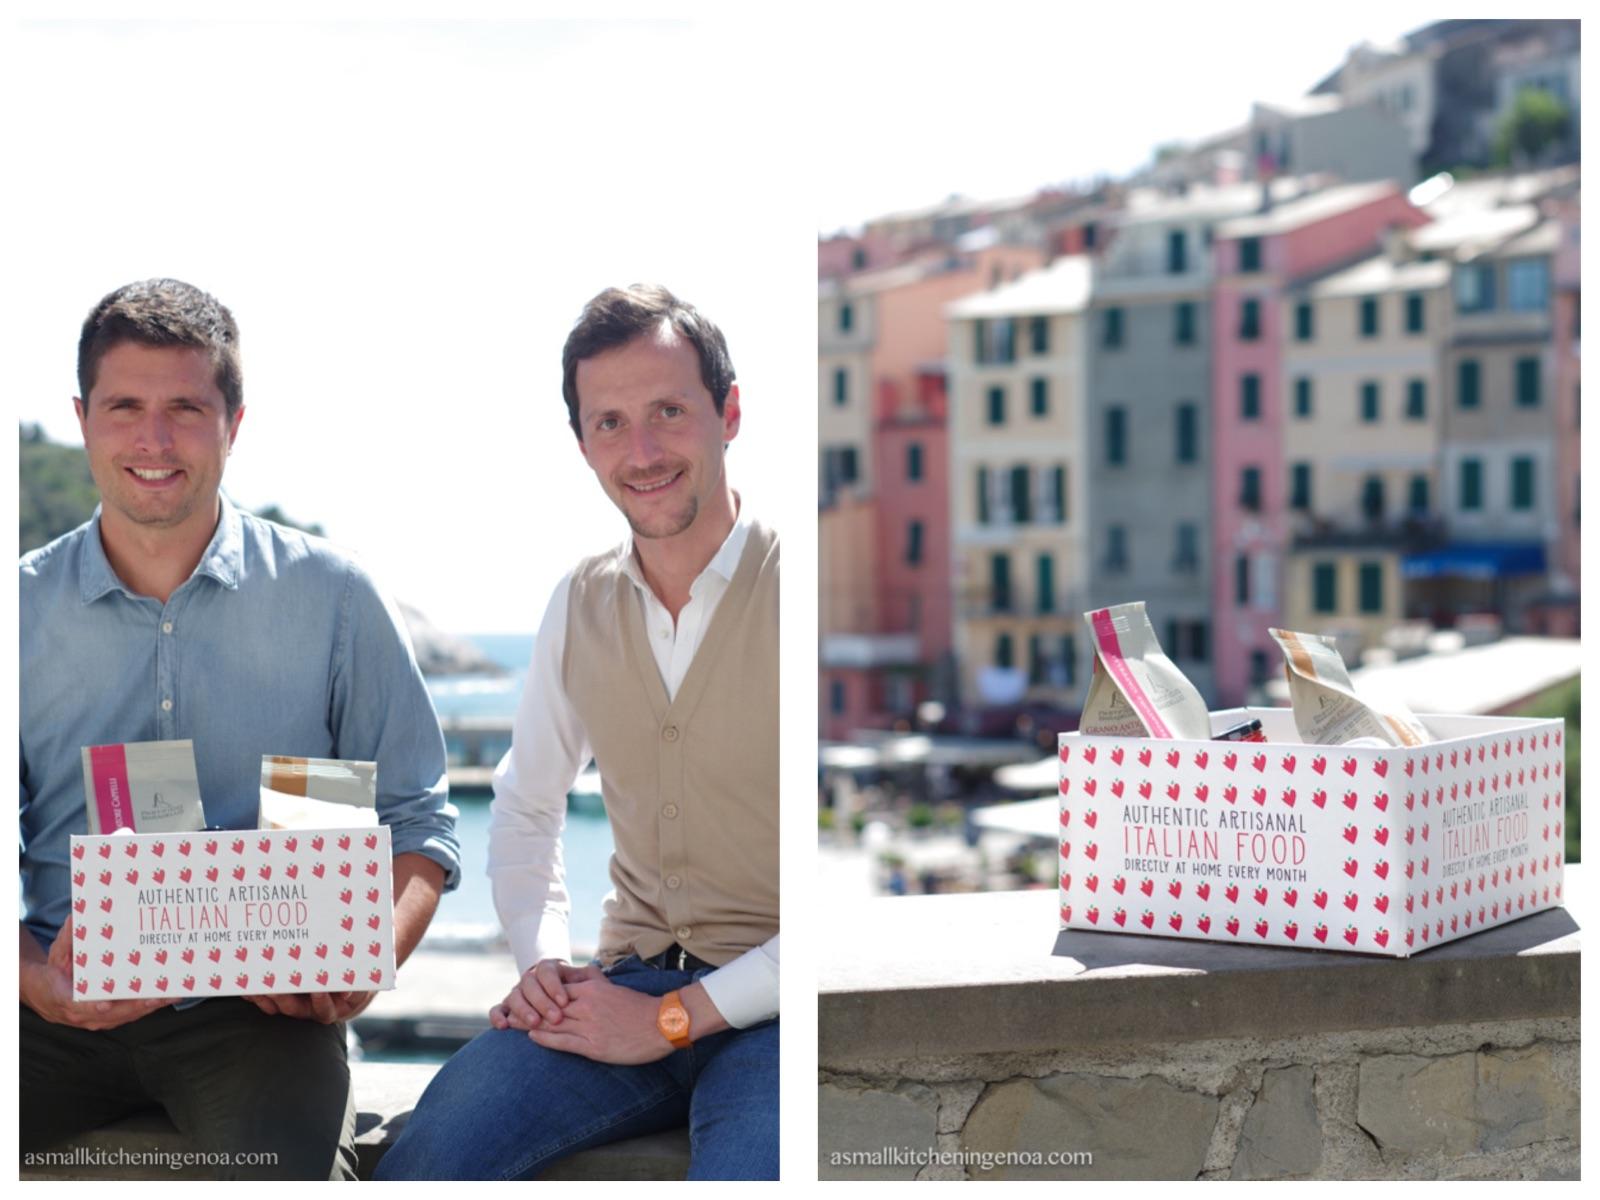 Eattiamo: Cinque Terre box for asmallkitcheningenoa